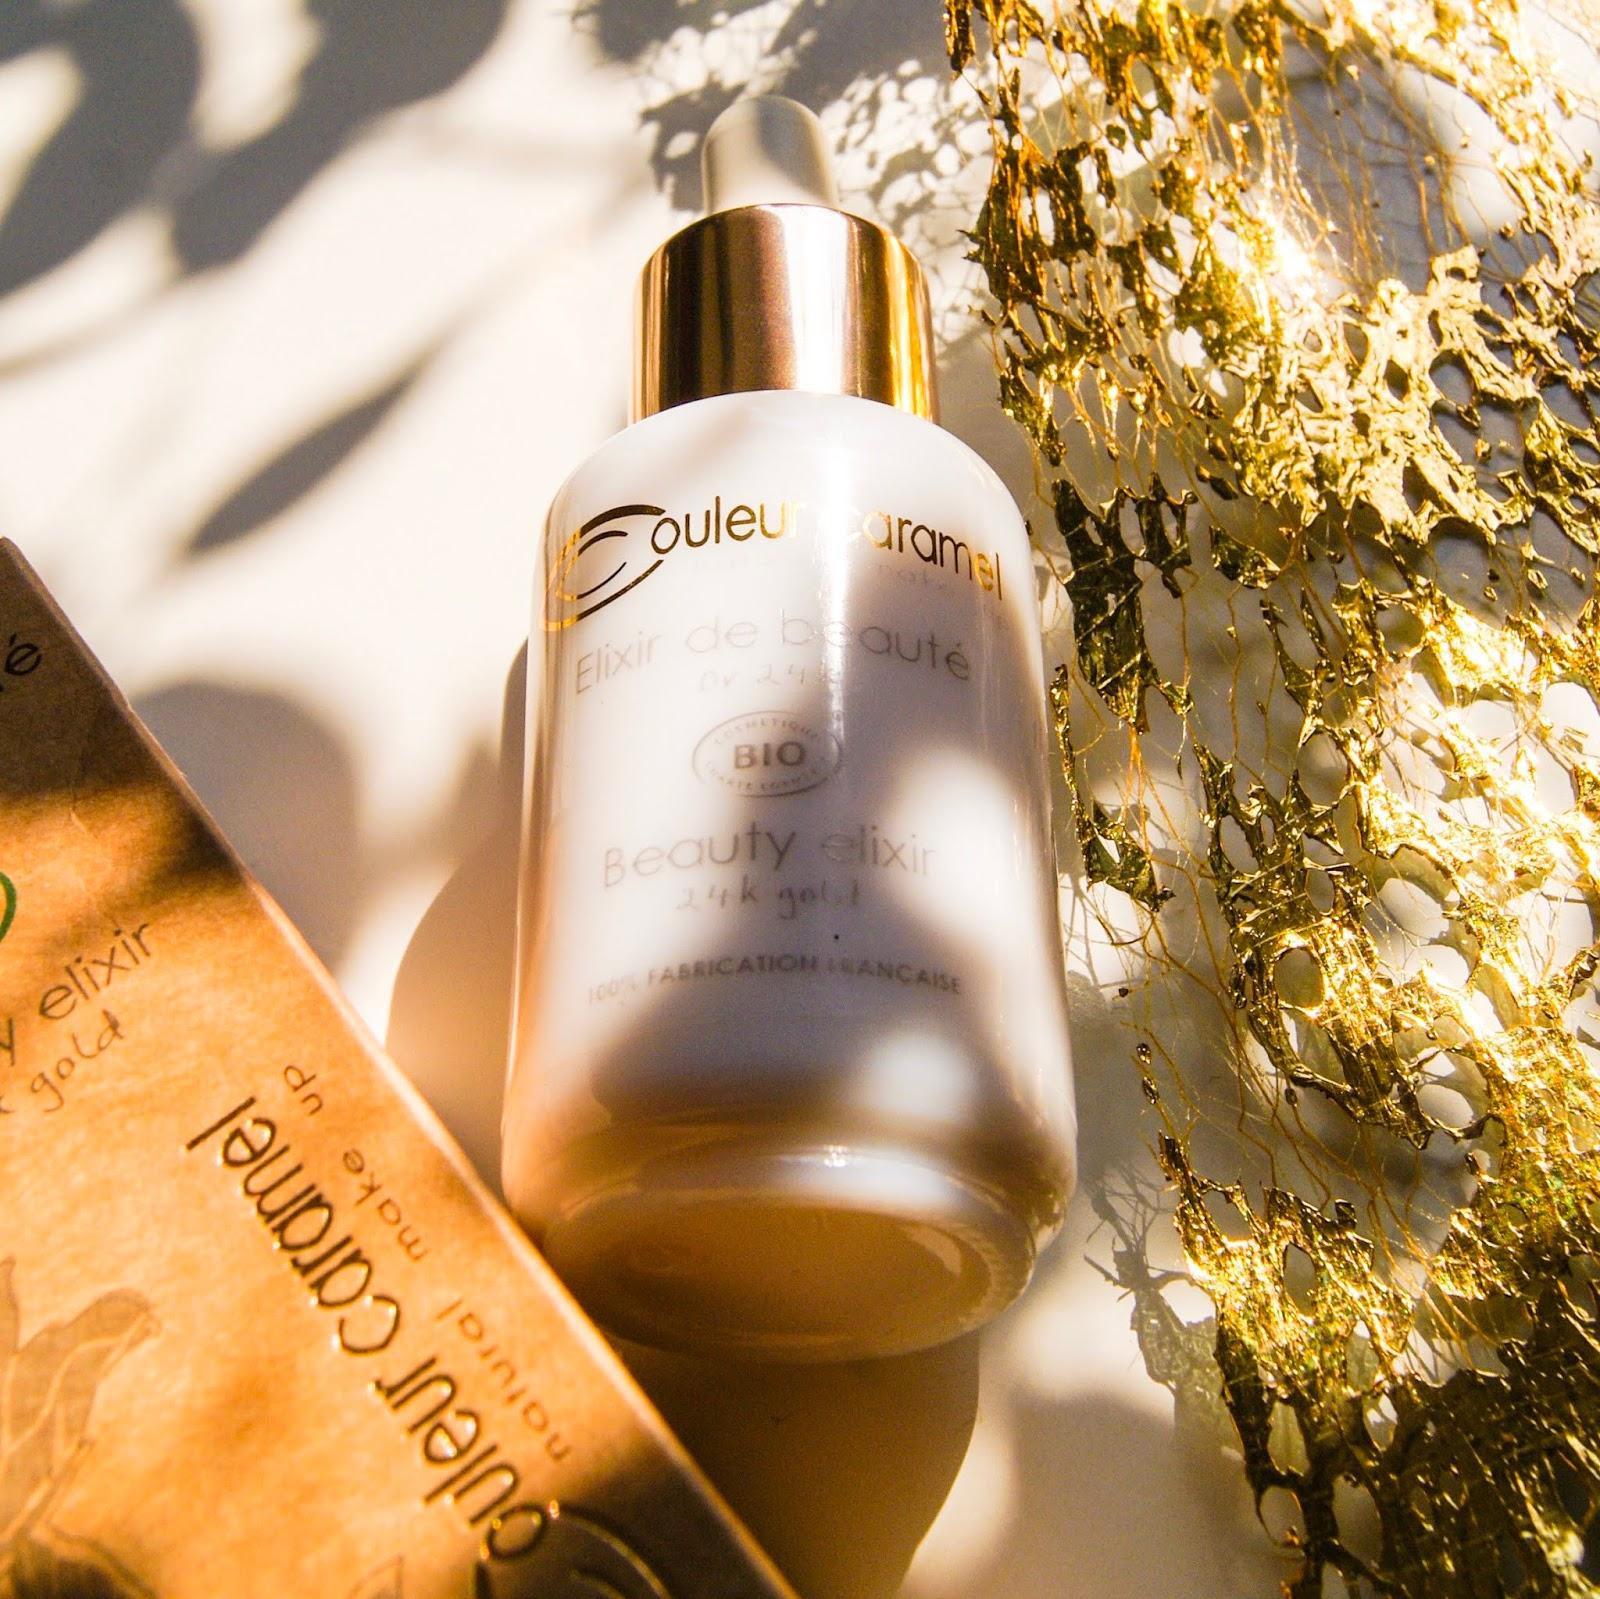 Beauty Elixir / Elixir de Beauté 24k gold od Couleur Caramel ze sklepu ekozuzu.pl - recenzja, opinie, naturalna pielęgnacja, naturalny makijaż